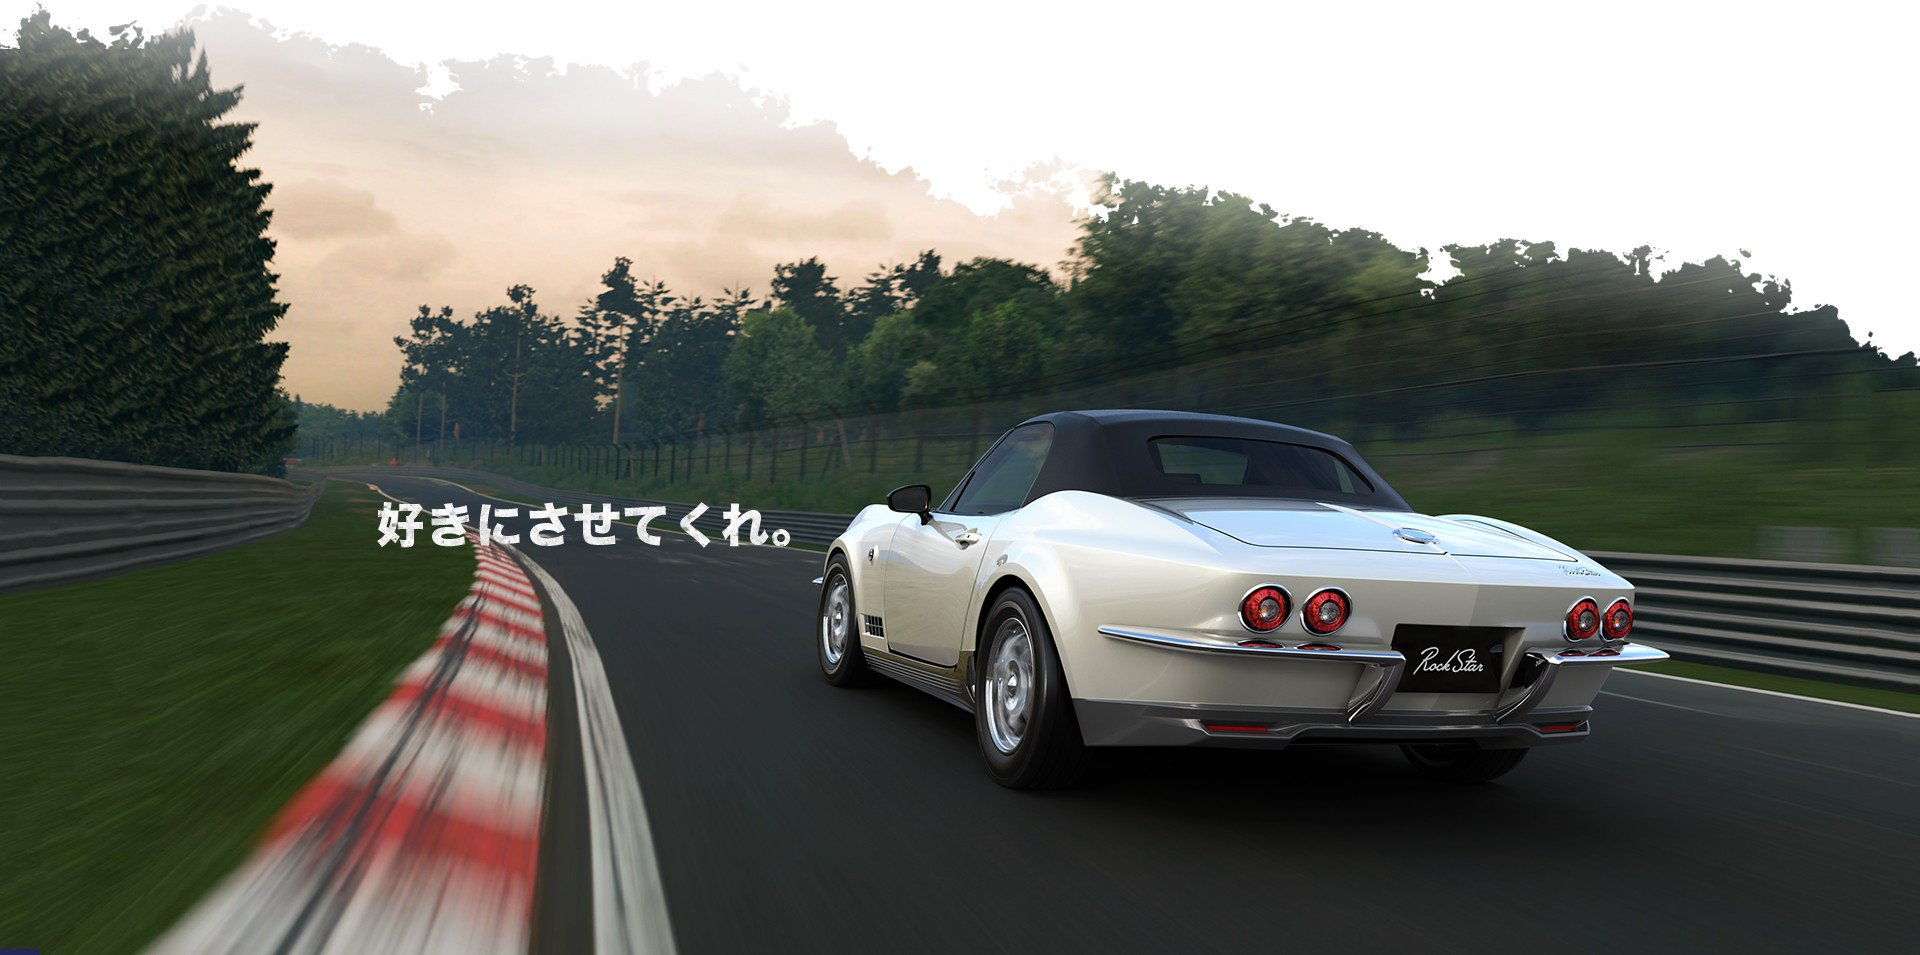 mitsuoka rock star is half mazda mx 5 miata  half skyactiv manual transmission fluid change mazda 2 skyactiv manual transmission